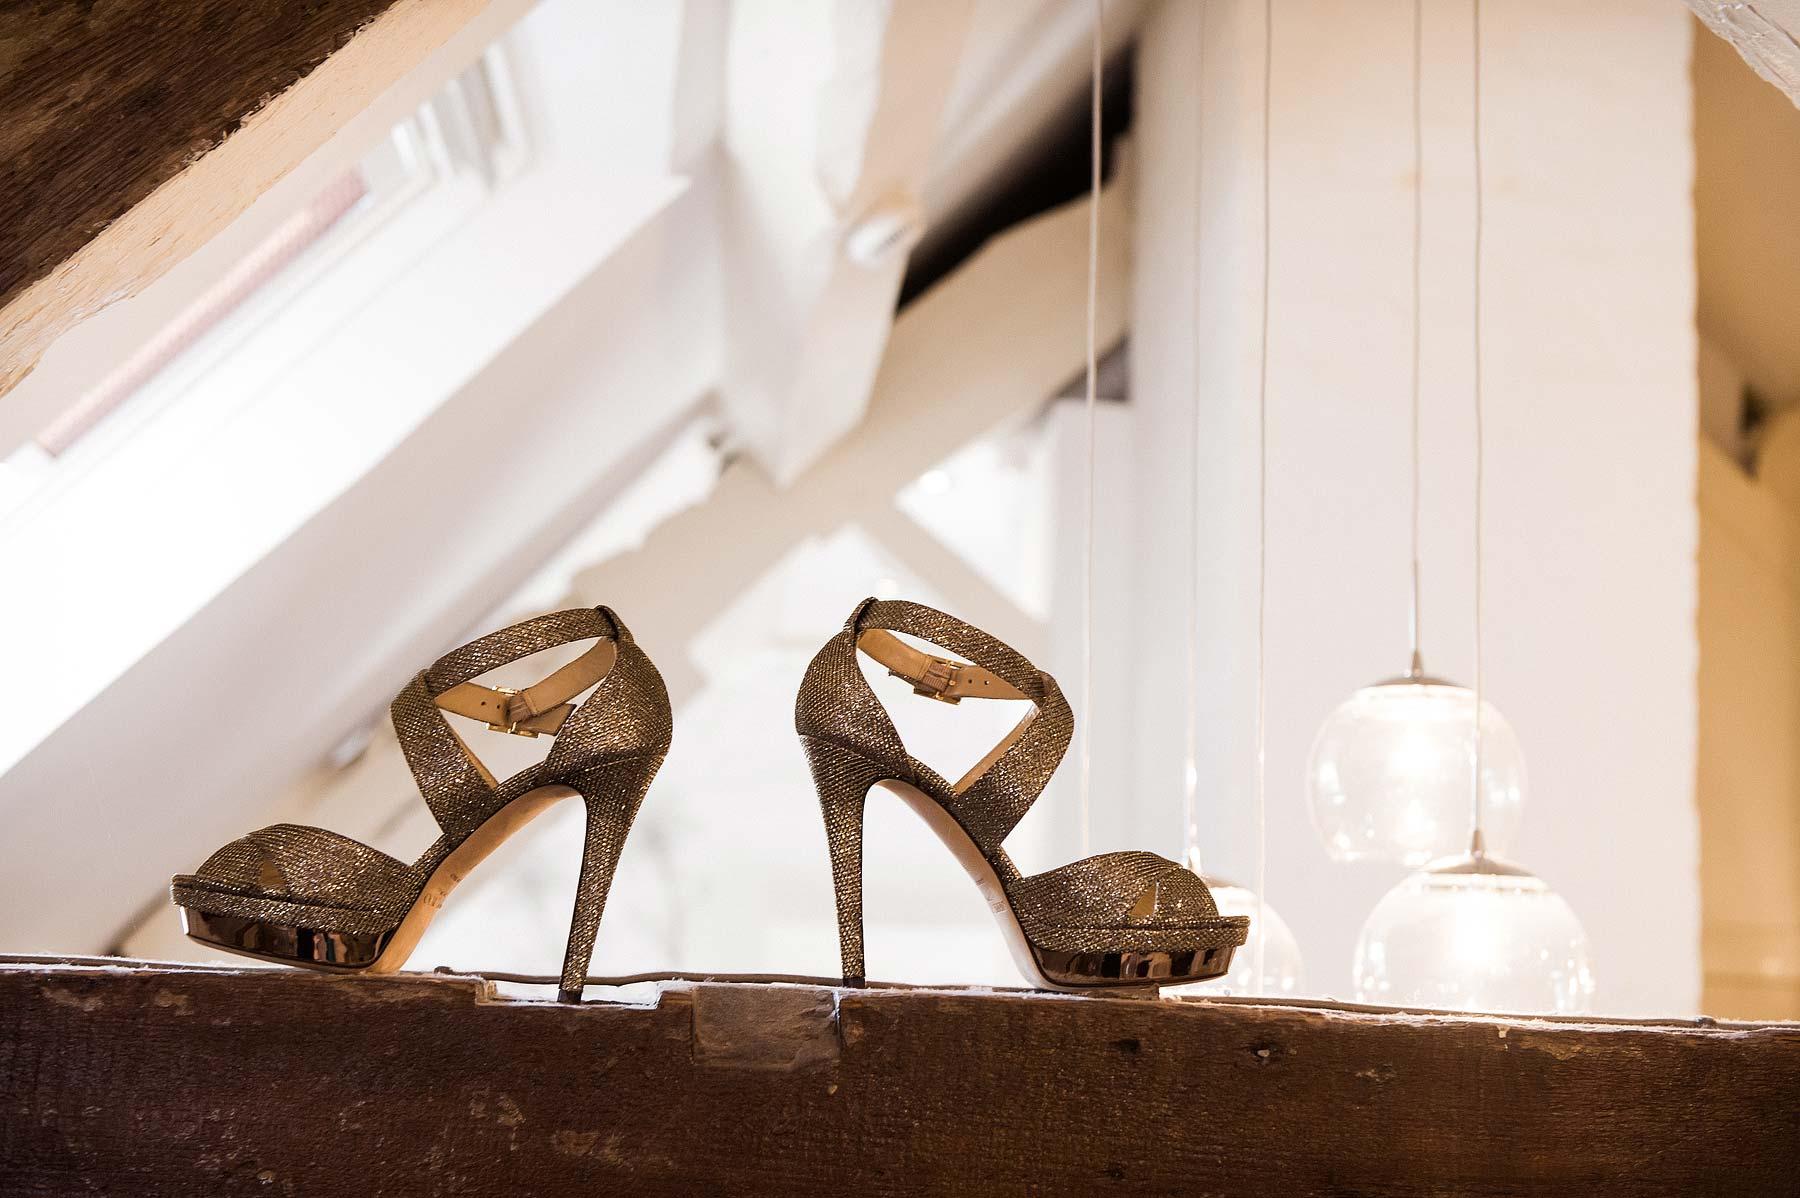 sandon-hall-wedding-photographers-004